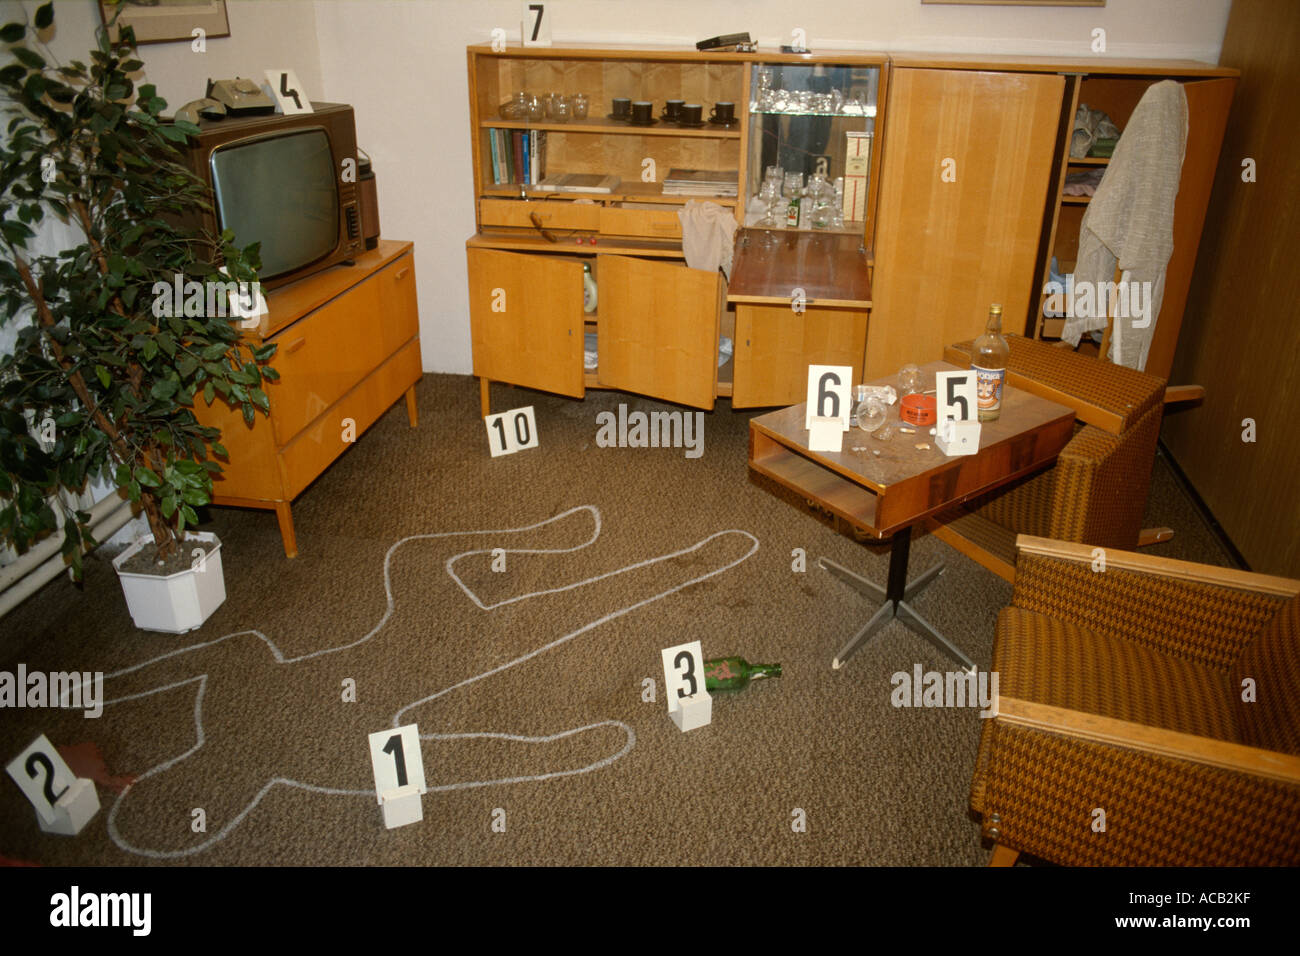 Prague Czech Republic Murder crime scene exhibit in the Police Museum - Stock Image